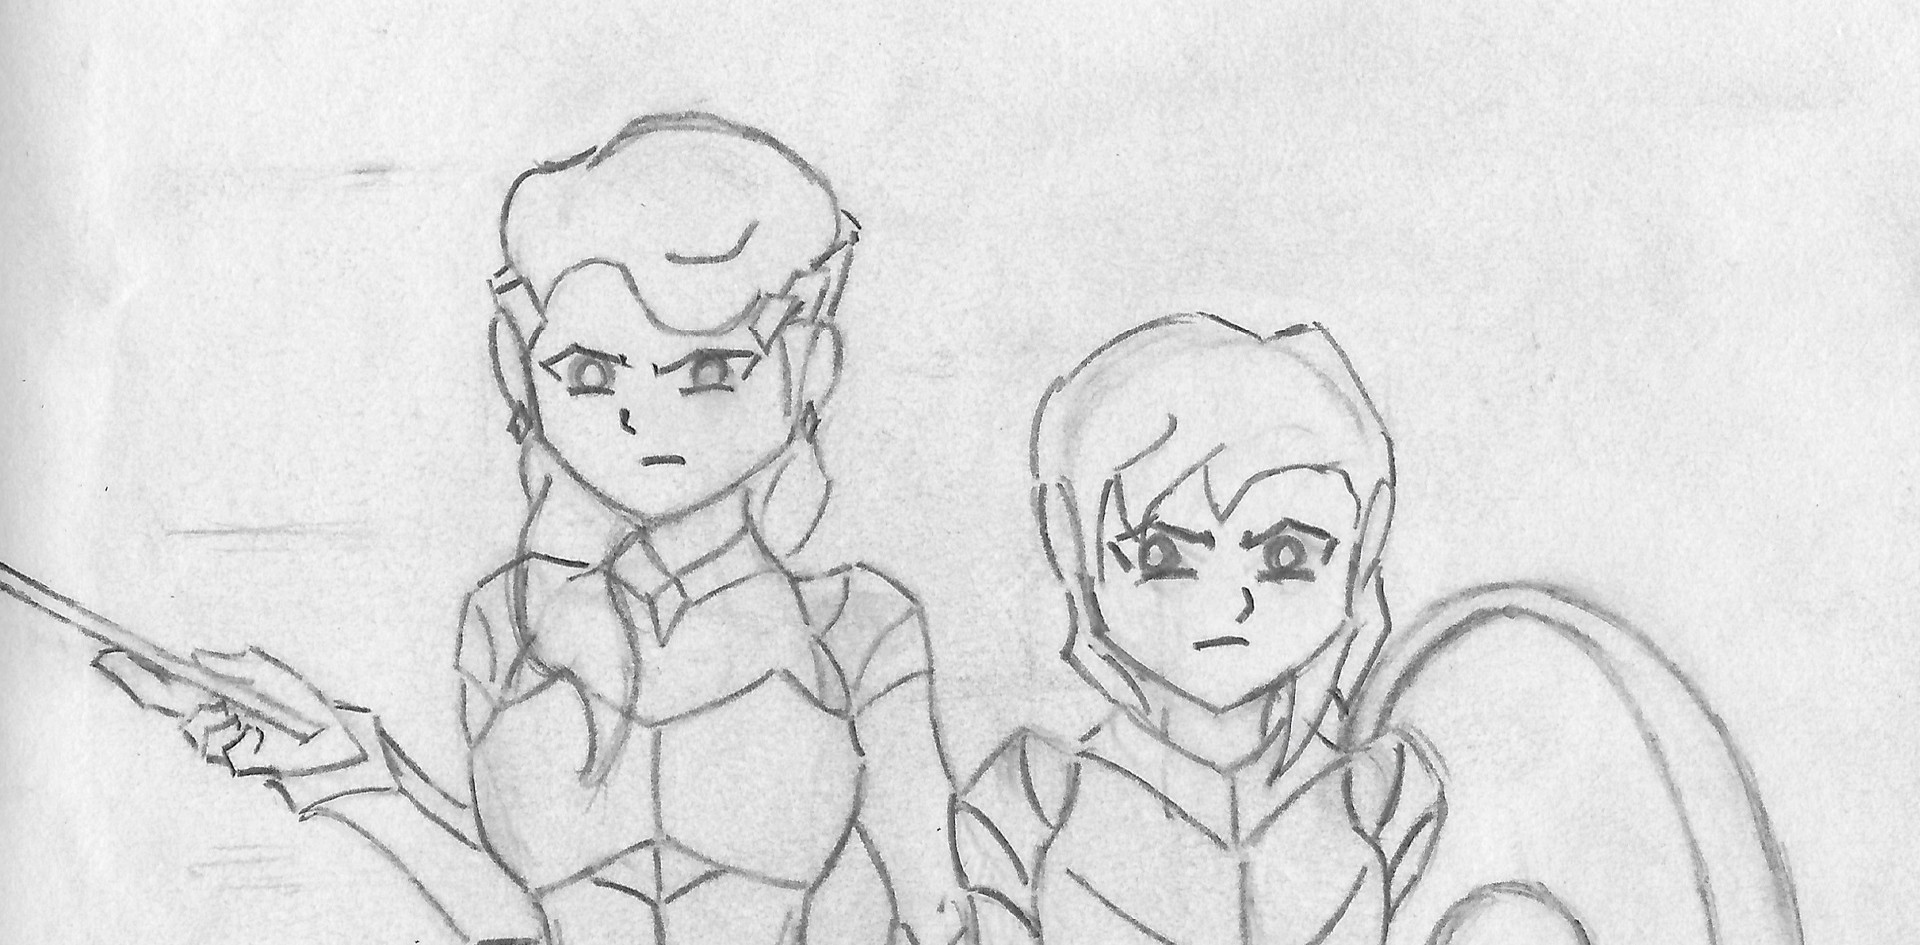 Hera and Athena